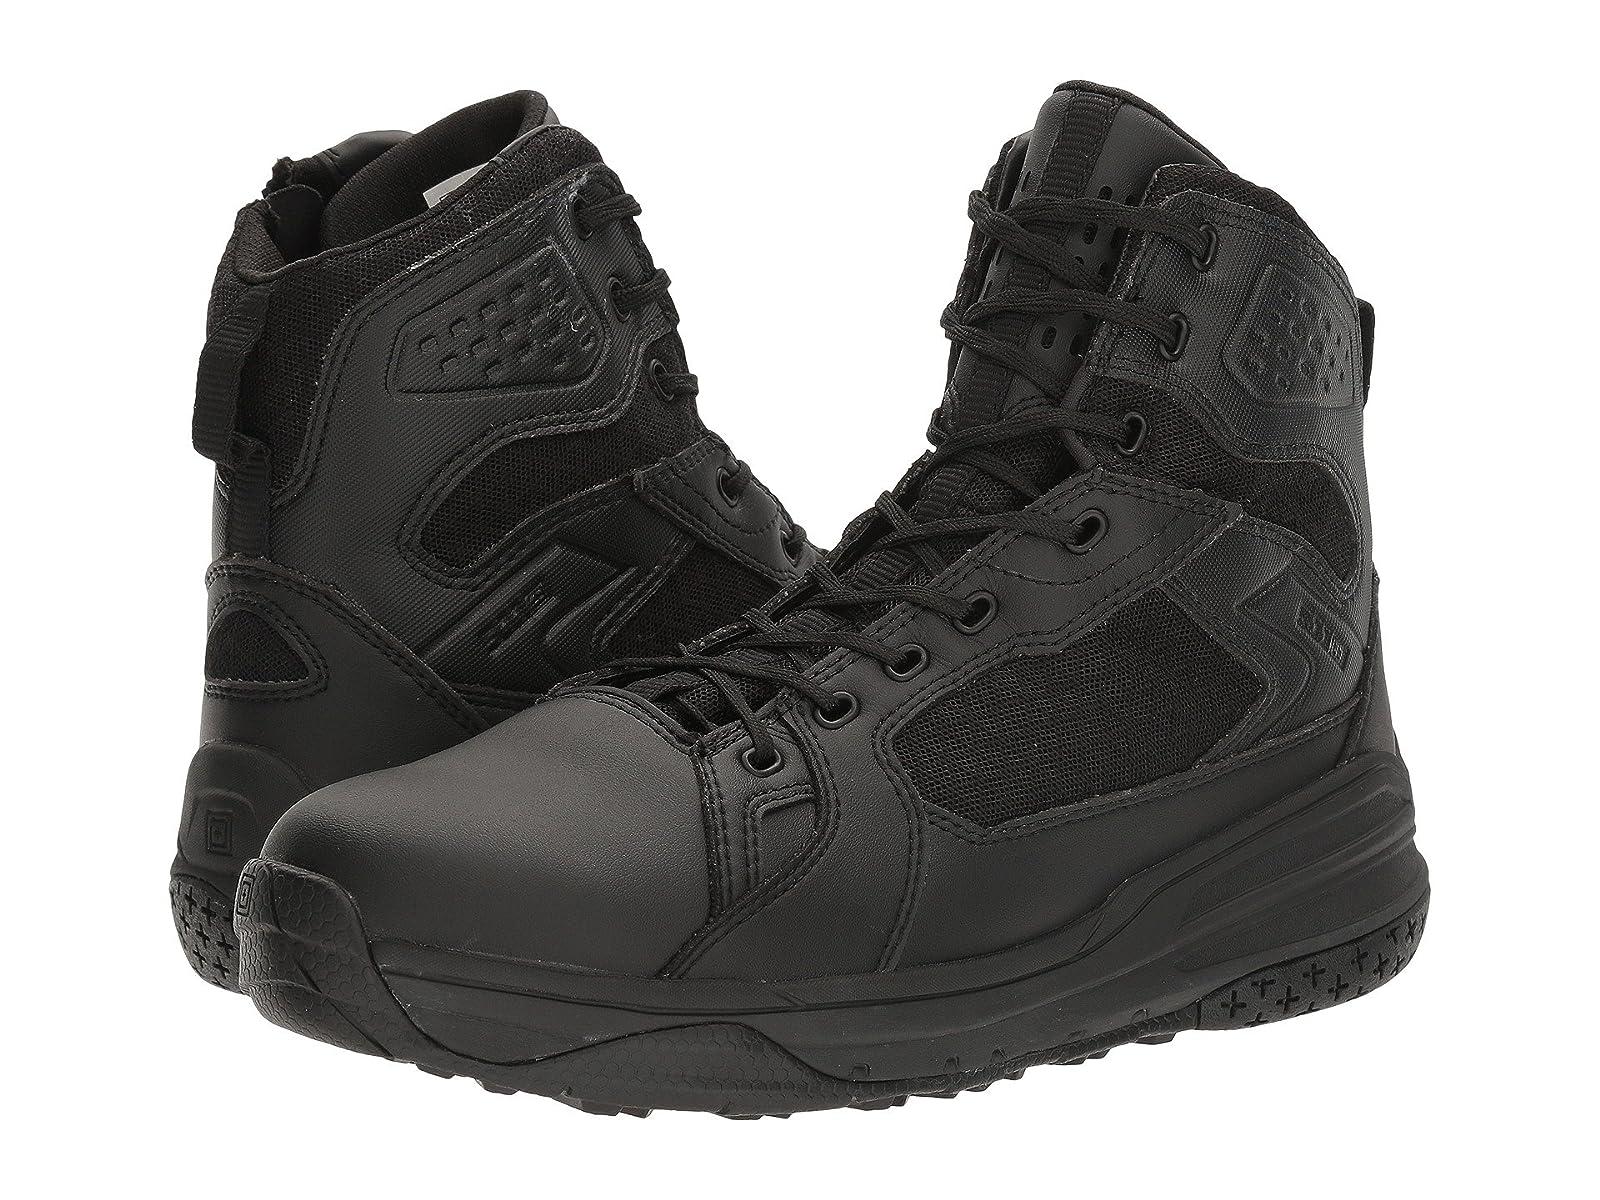 5.11 Tactical Halcyon Patrol BootsAffordable and distinctive shoes